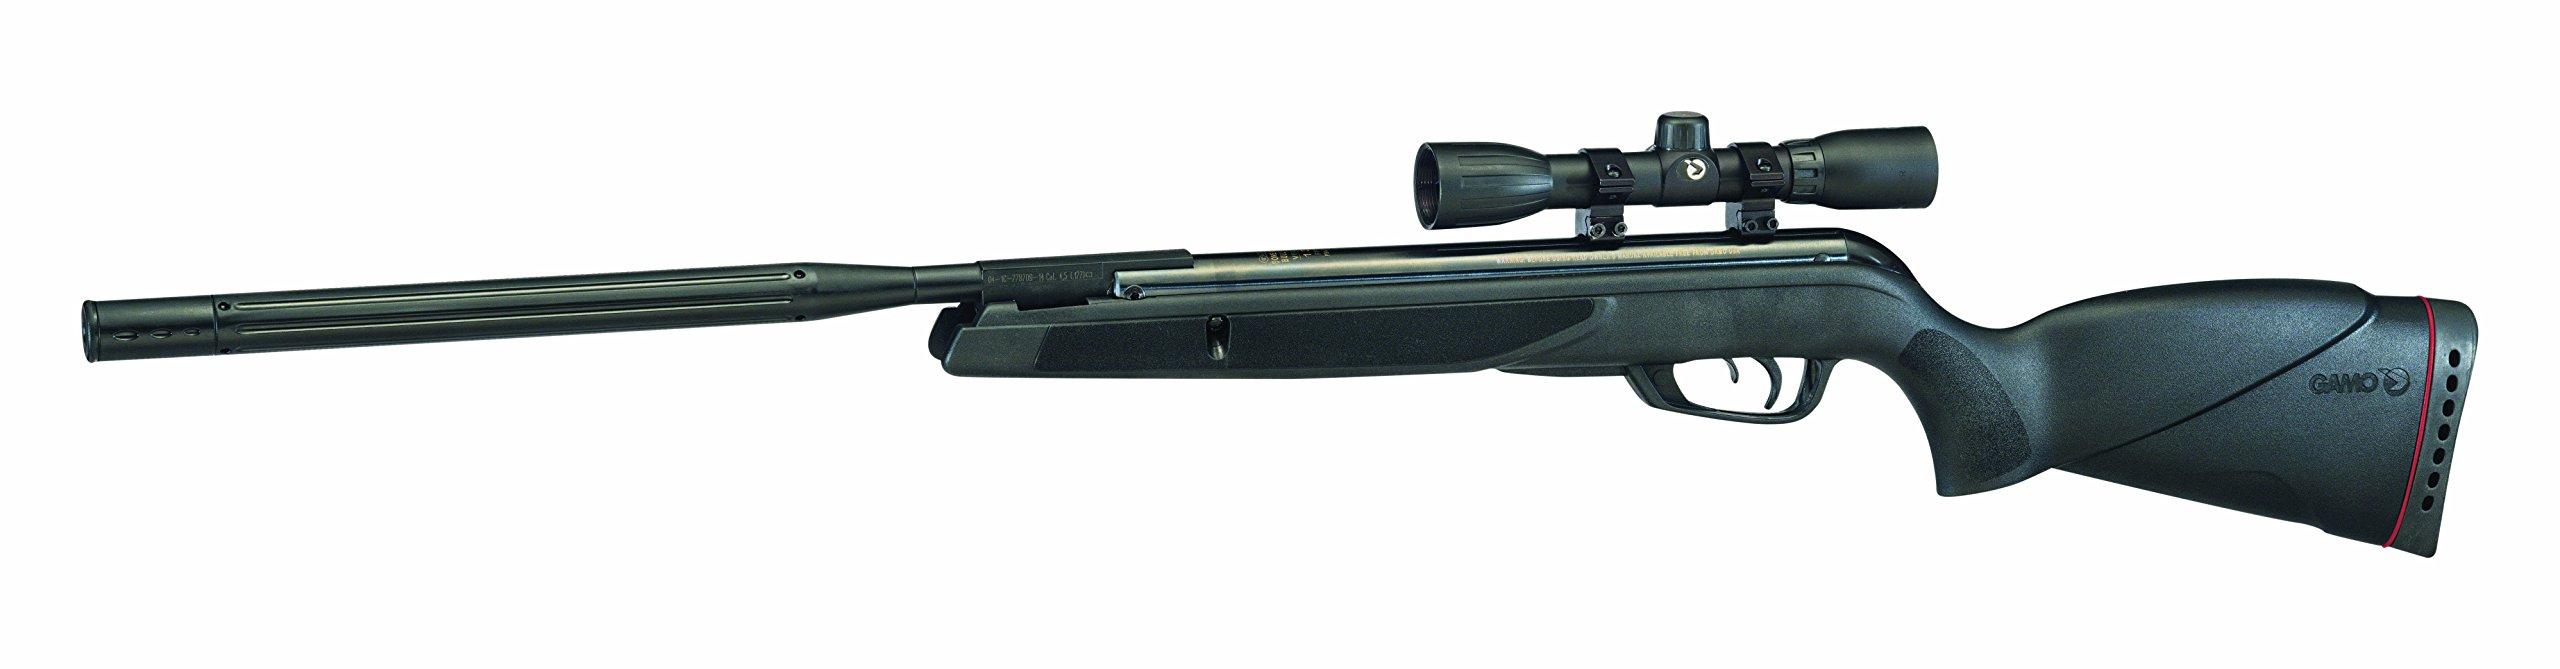 WildCat Whisper Air Rifle .22 Cal. by Gamo